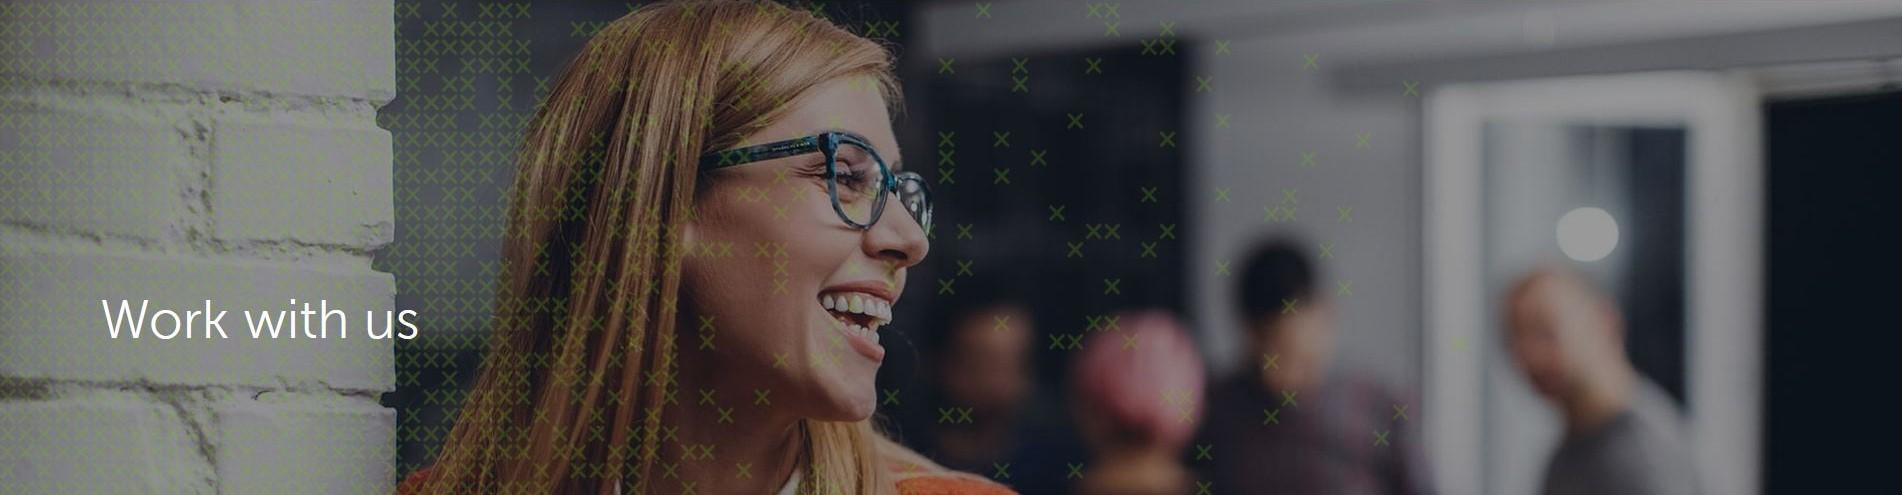 Enterprise Sales Manager UK (m/f/d) - Job London - Exasol Career